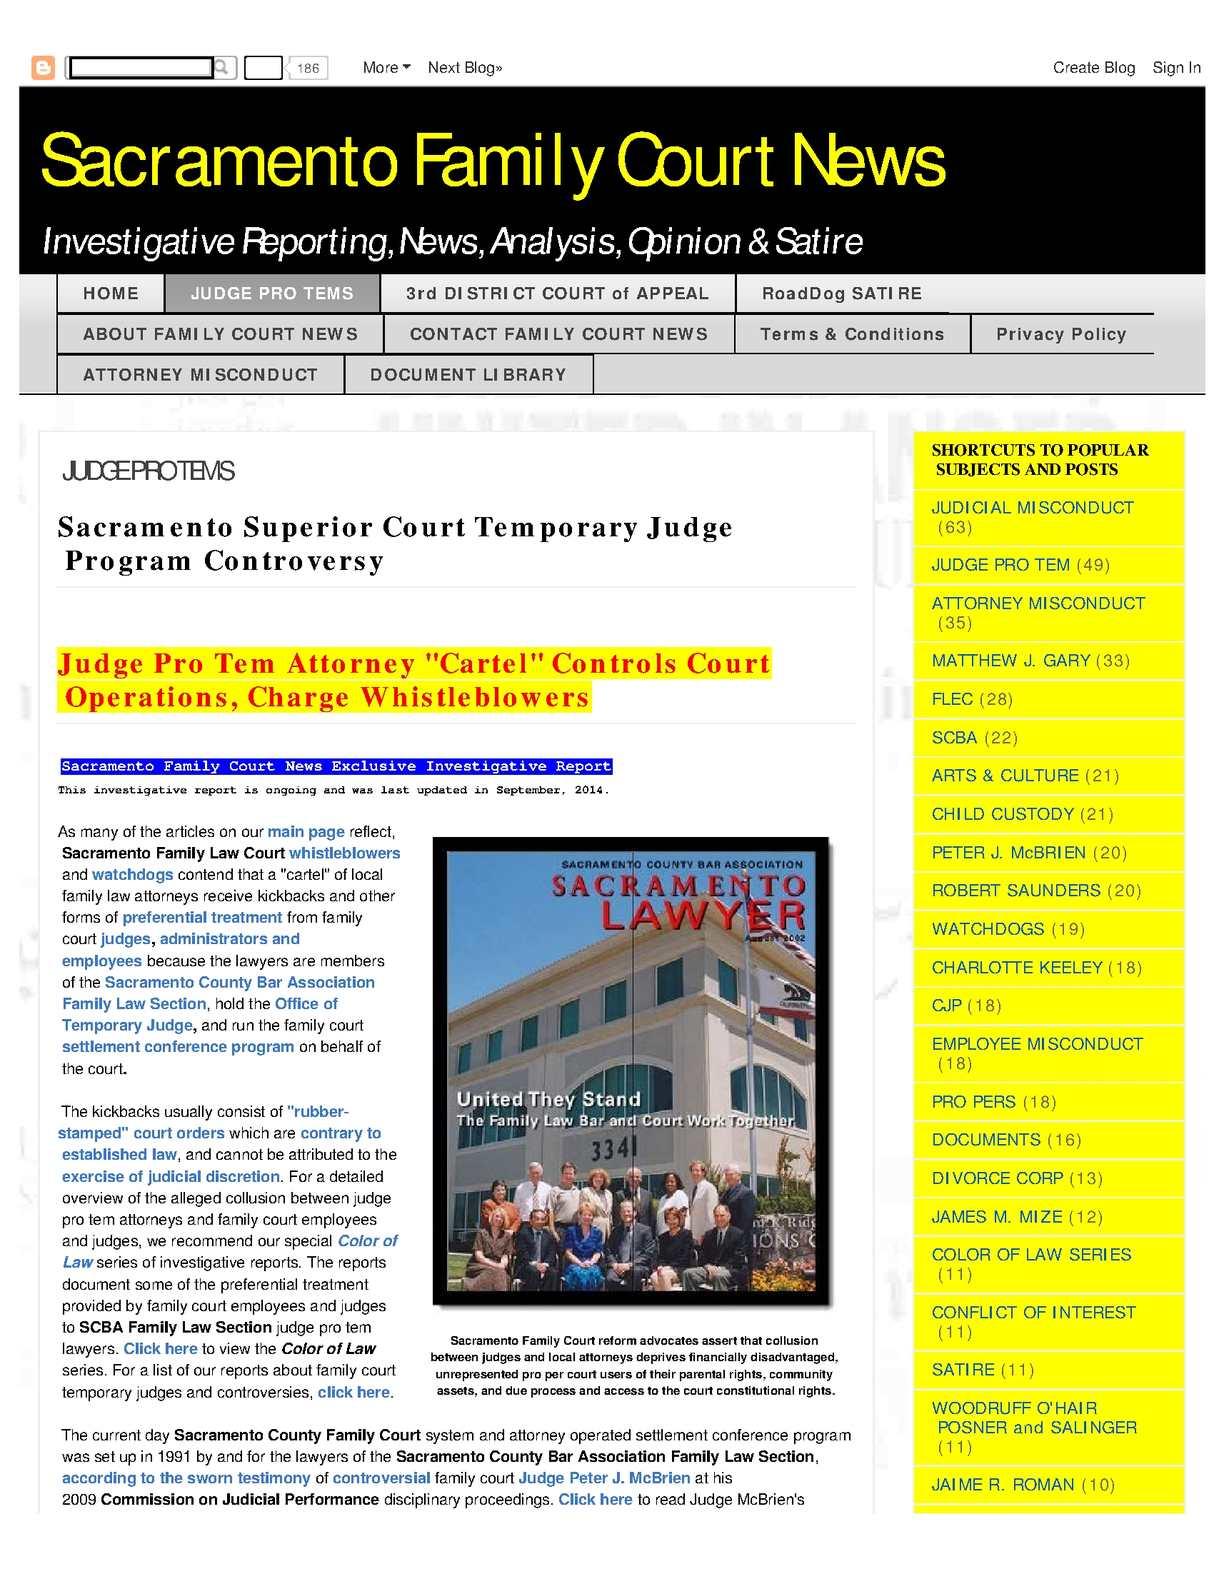 Calaméo - Temporary Judge Racketeering Honest Services Fraud